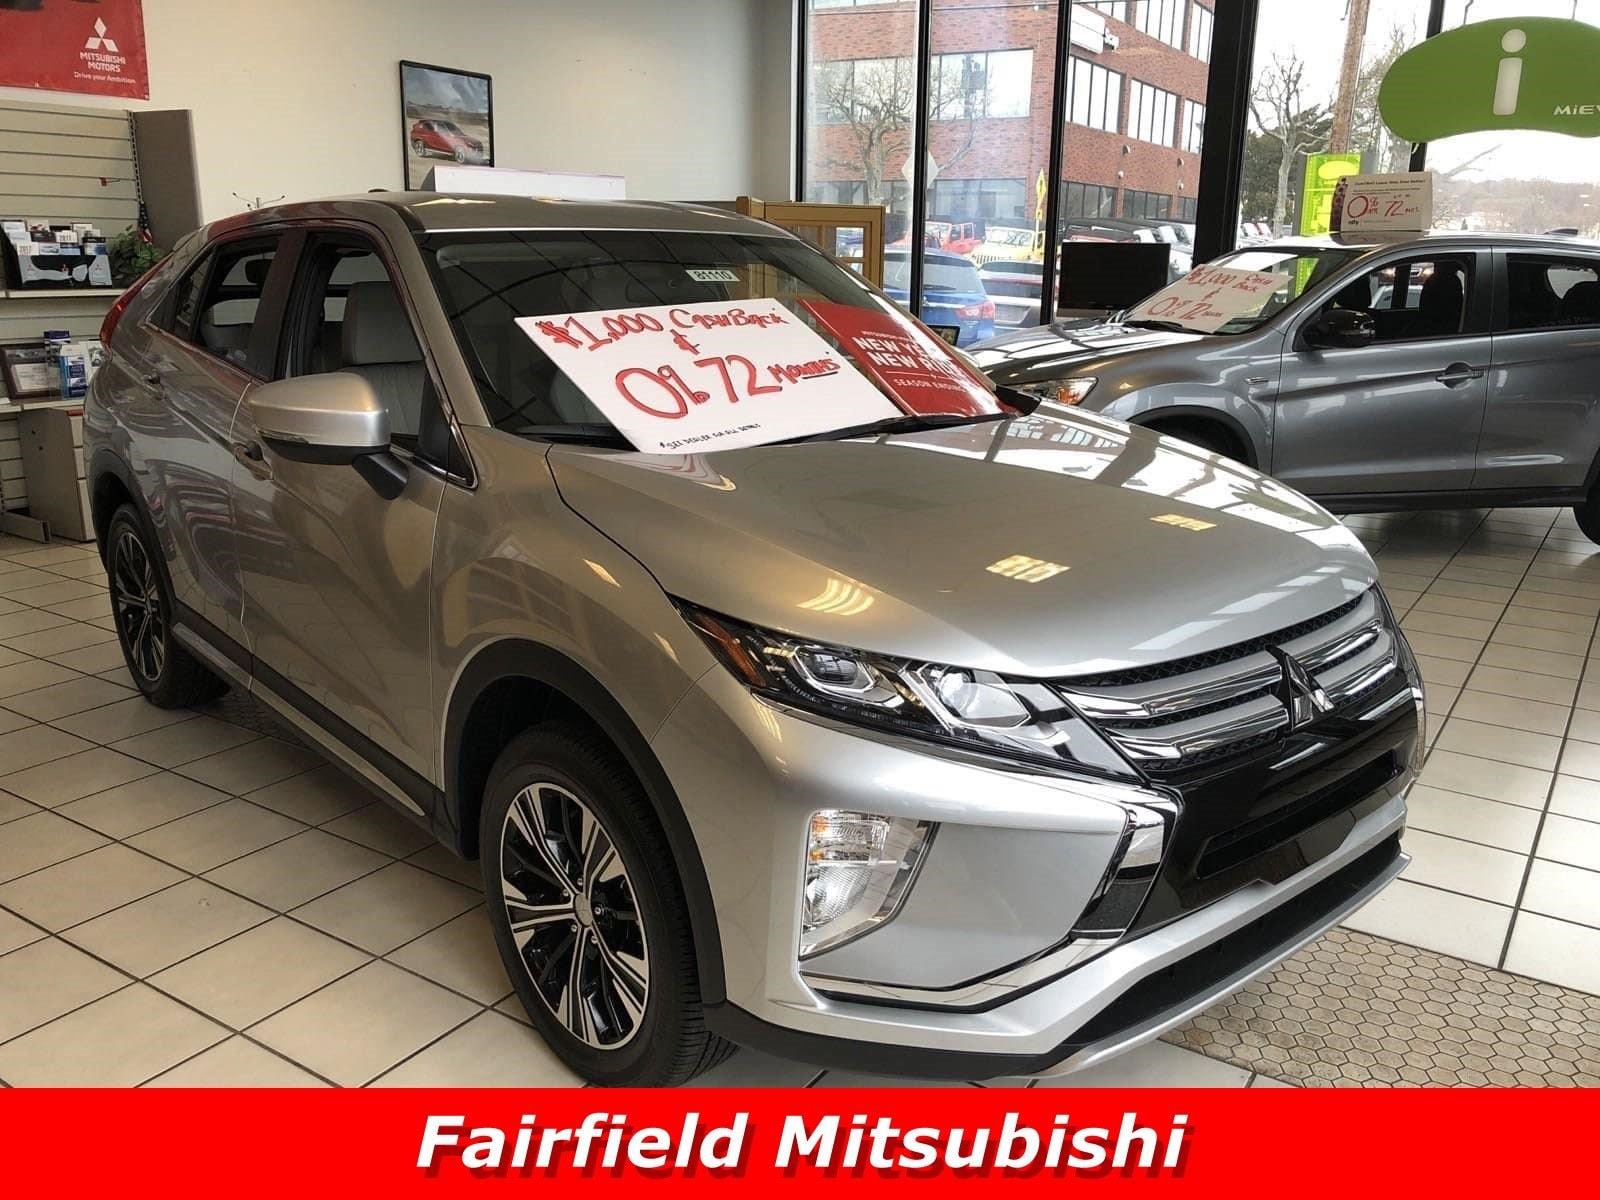 New 2018 Mitsubishi Eclipse Cross 1.5 SE CUV for sale near New Haven, Stamford & Waterbury